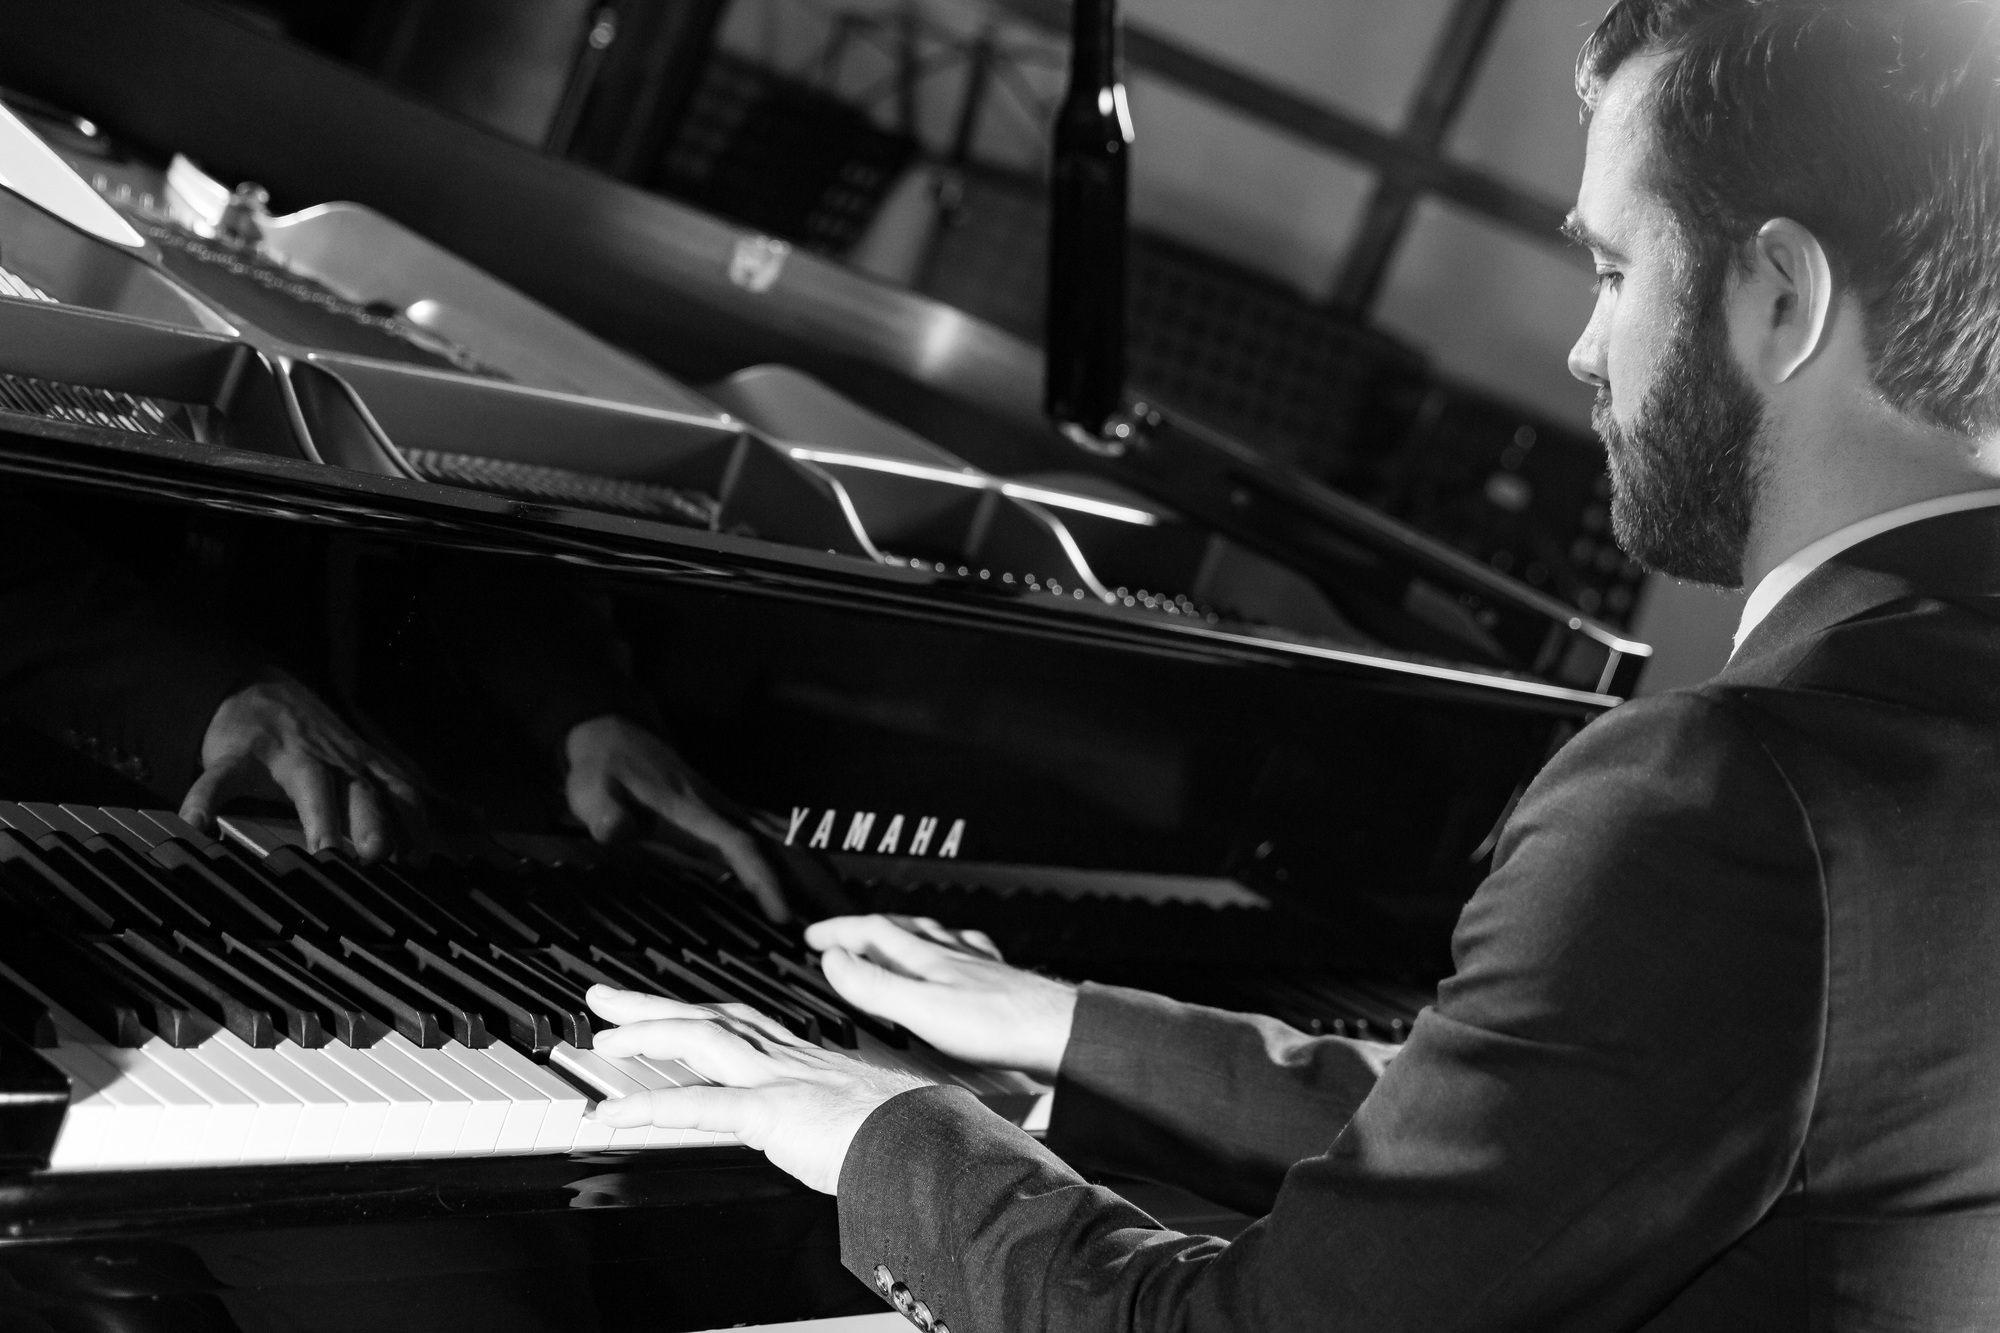 Promo Michael Keysman Pianist London